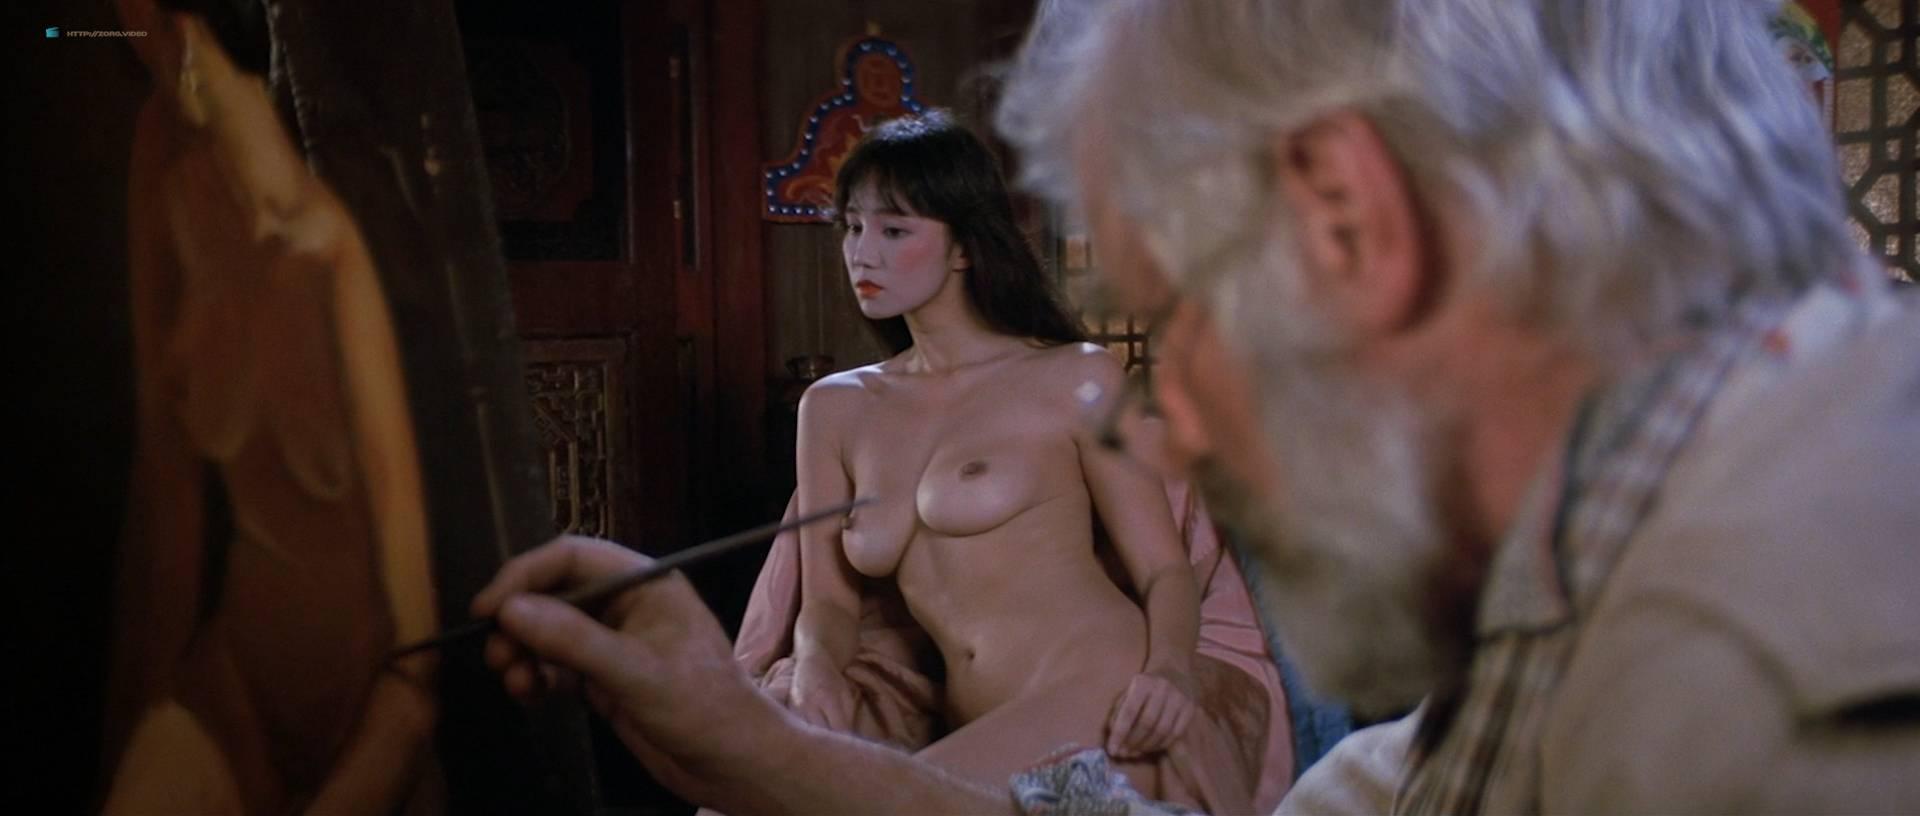 Hot women magazine nude photos